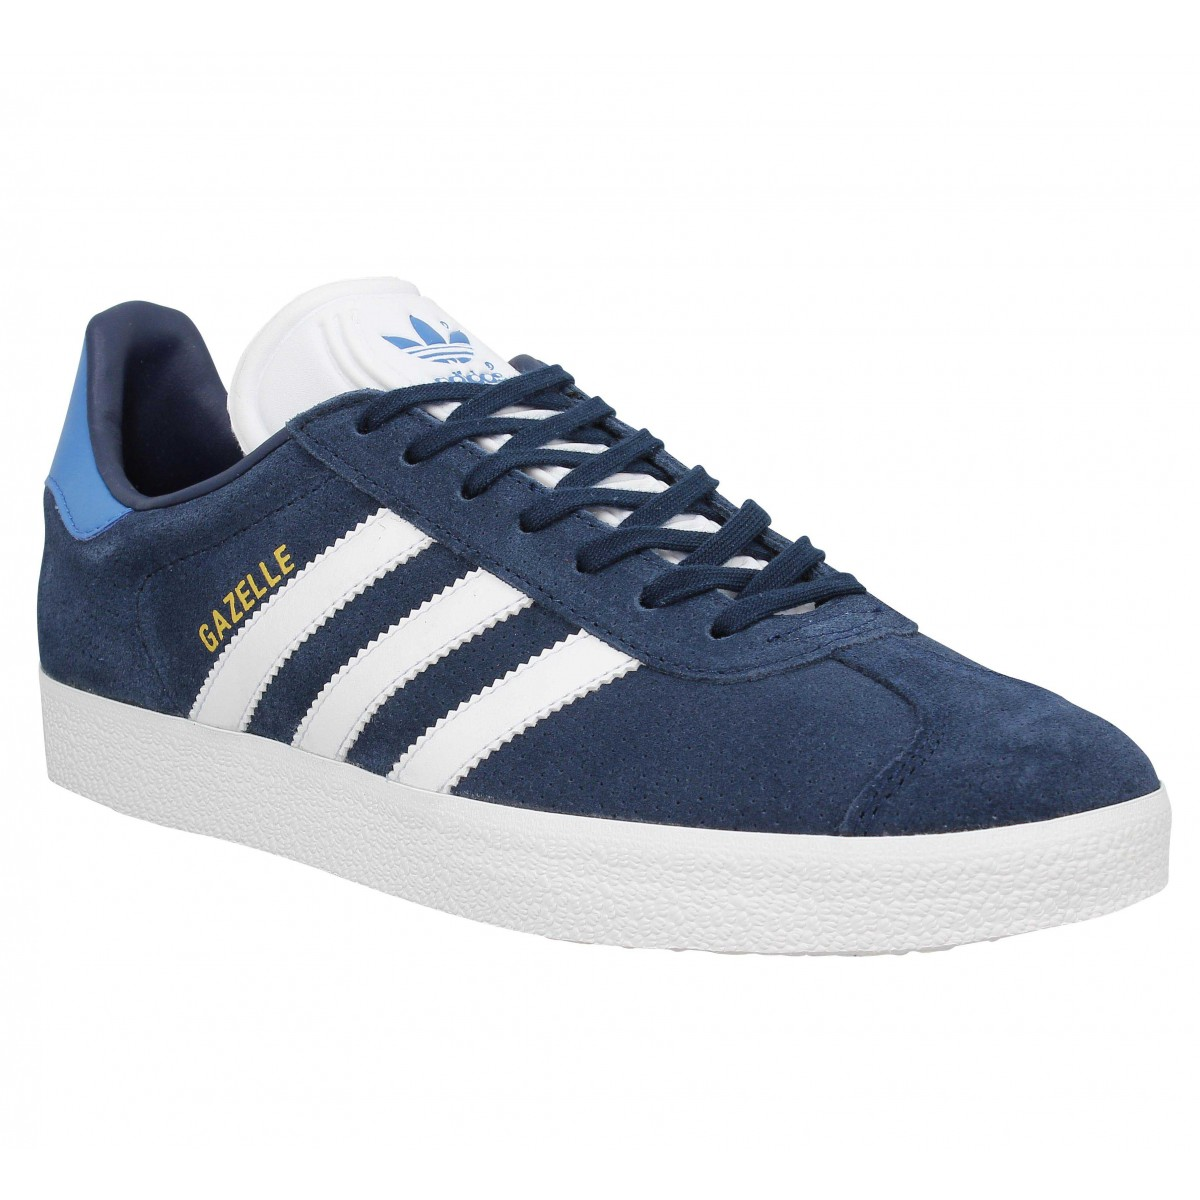 Adidas Homme Gazelle Velours -40-bleu...